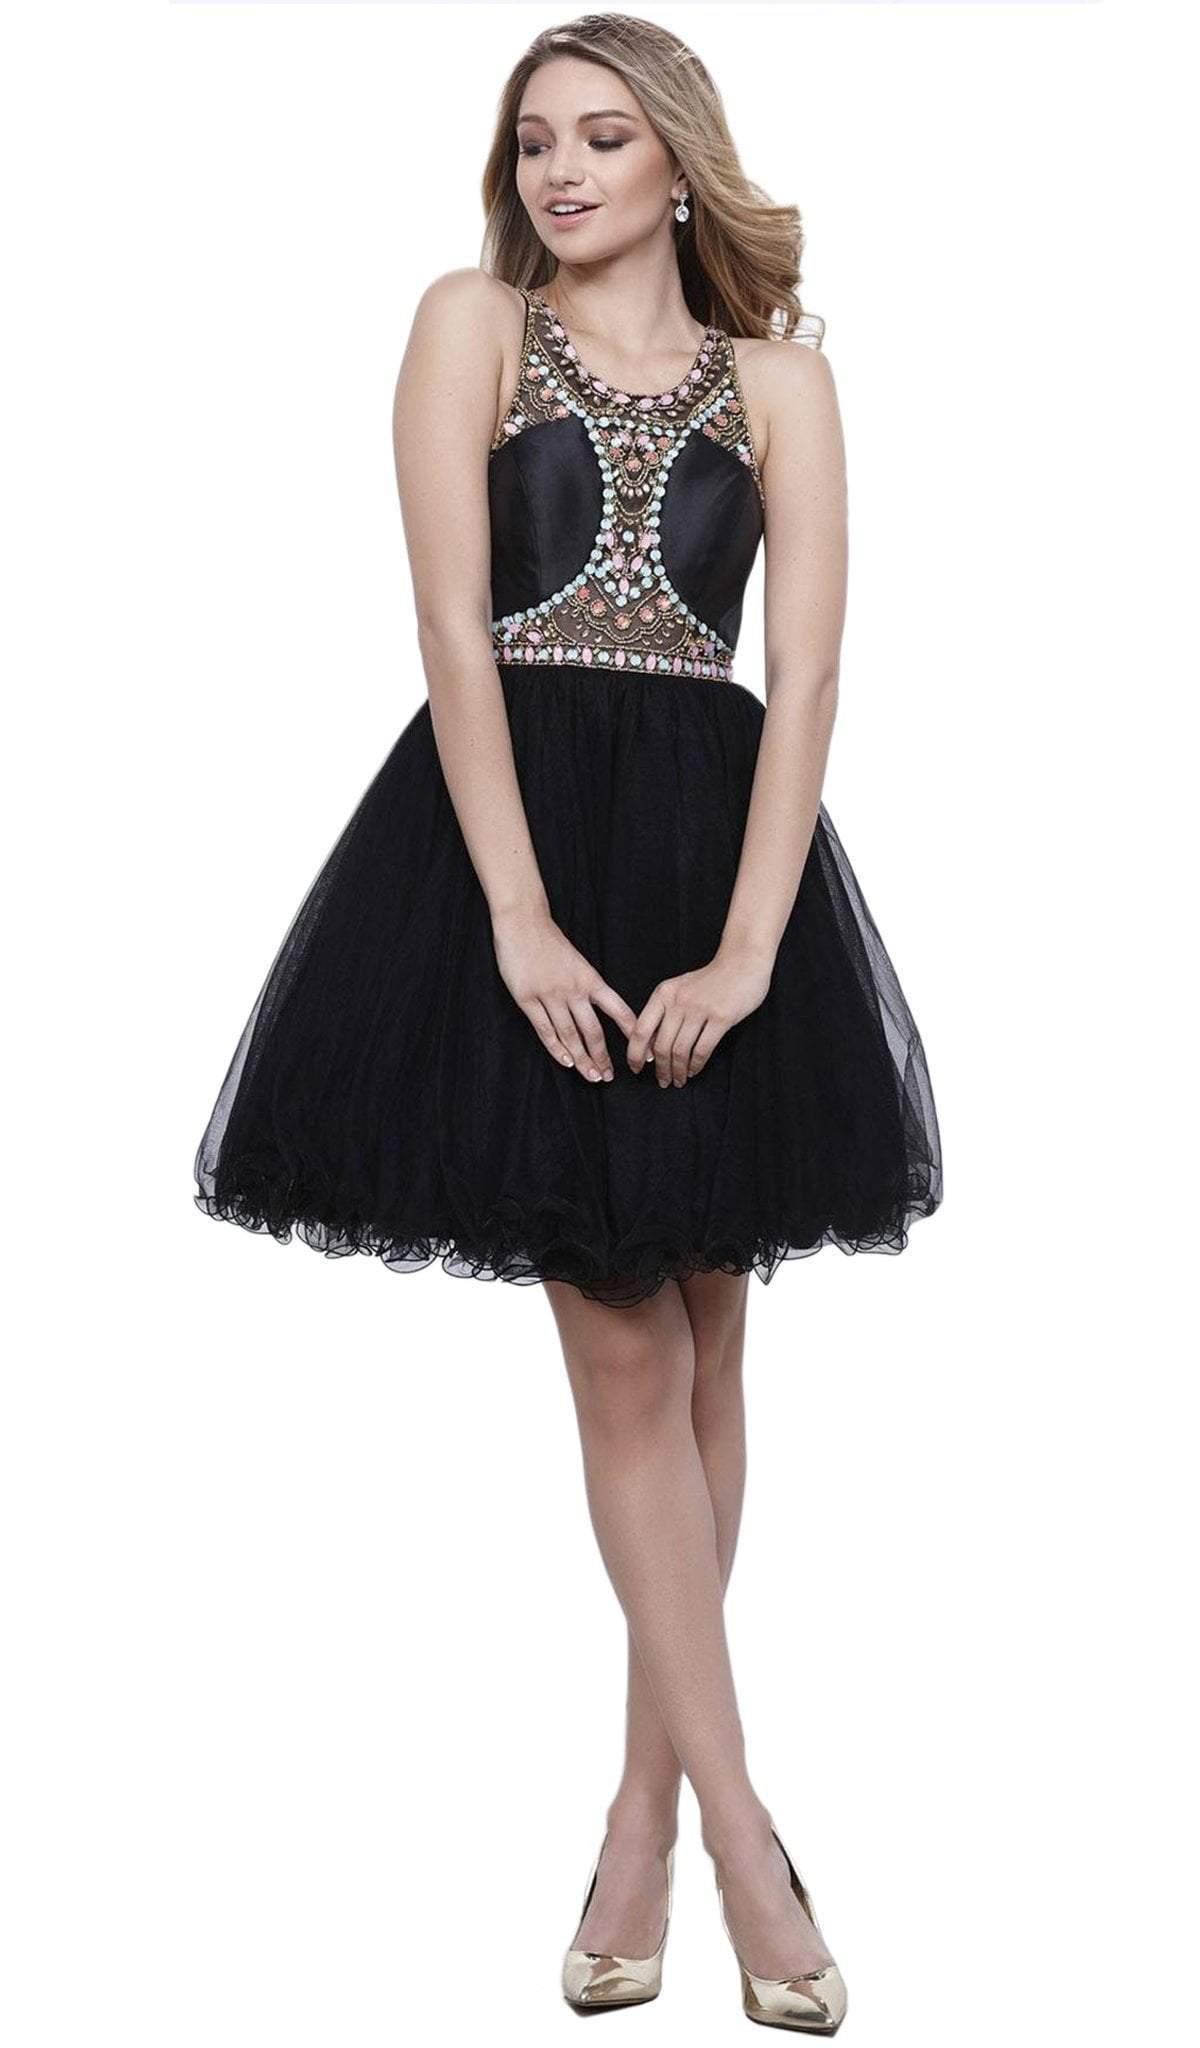 Nox Anabel - 6250 Beaded Sleeveless Cocktail Dress